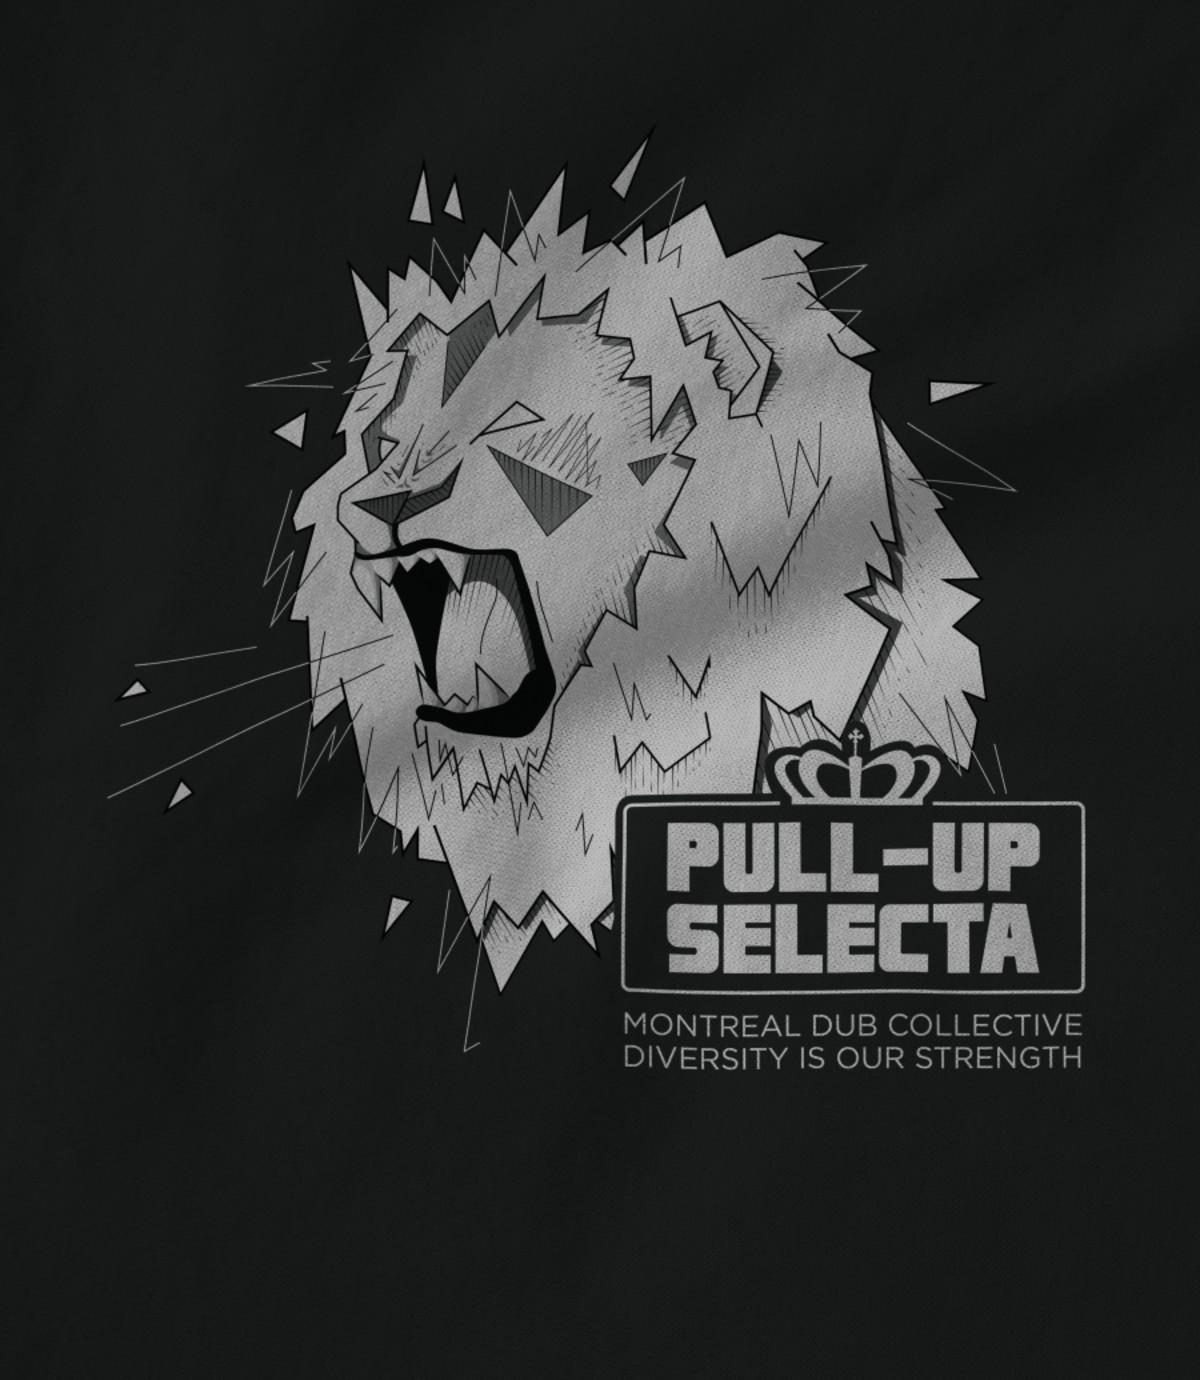 Pull up selecta mtl pull up selecta   dub lion 1551107897